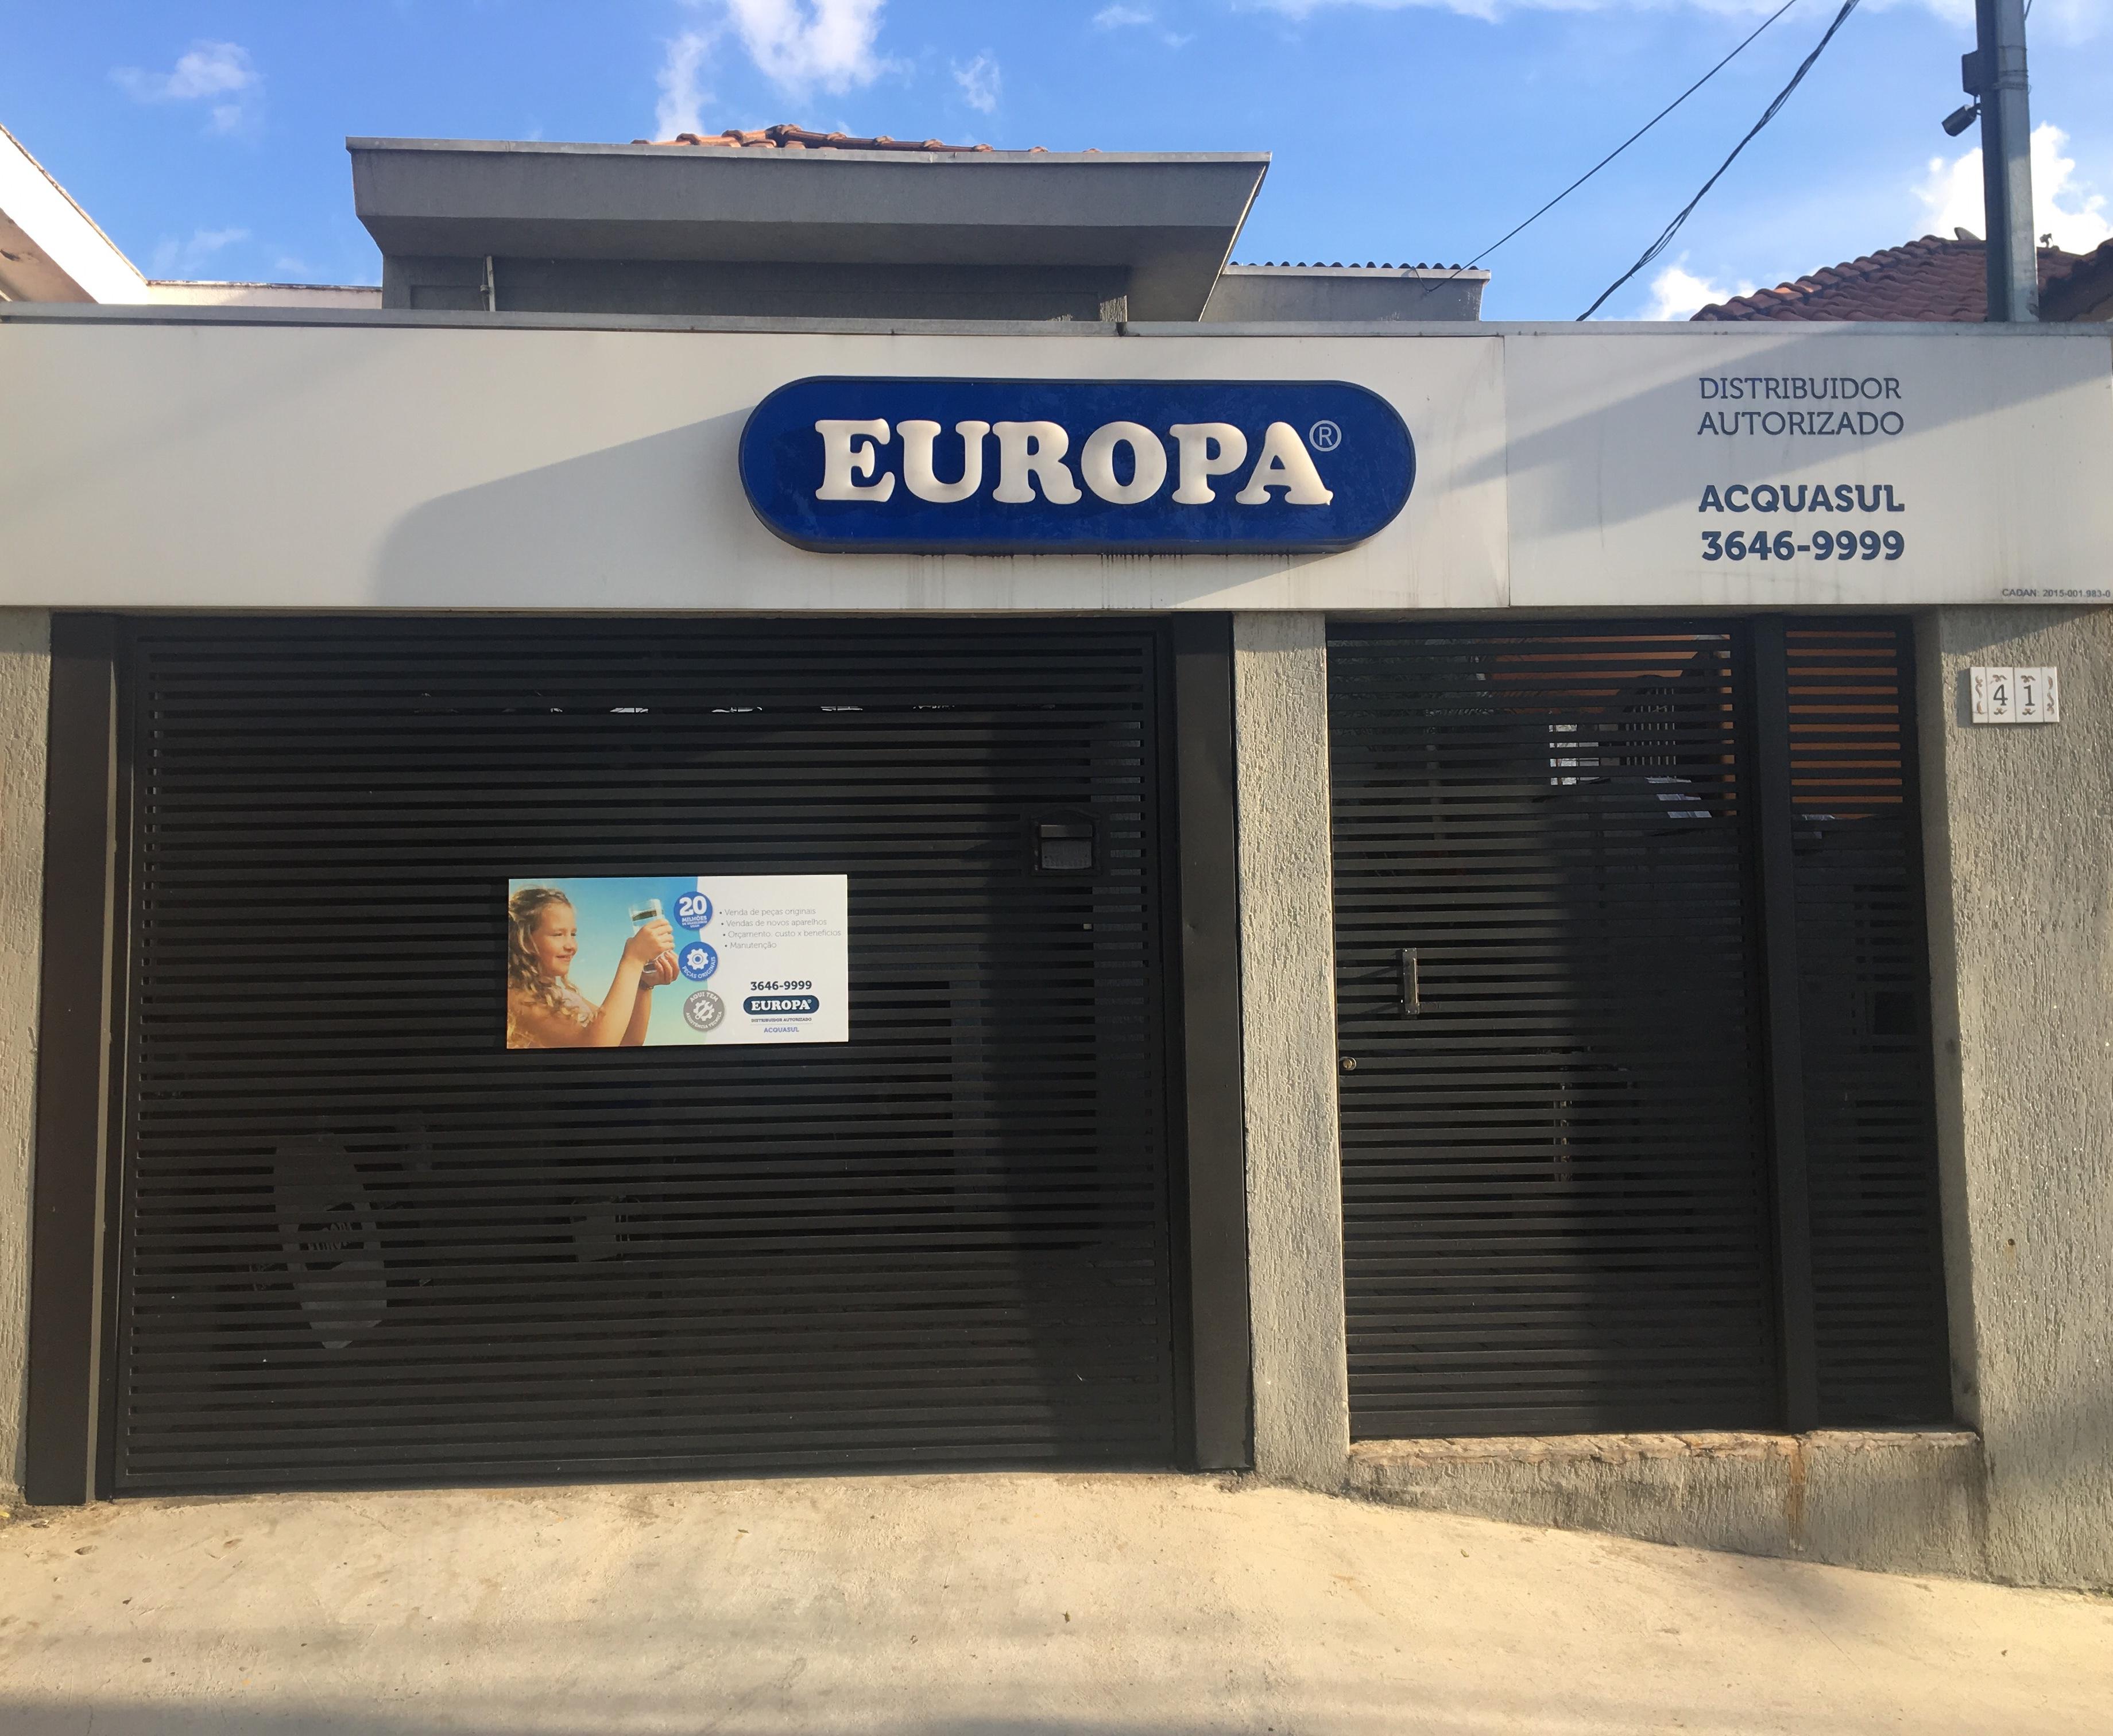 Distribuidor autorizado Europa